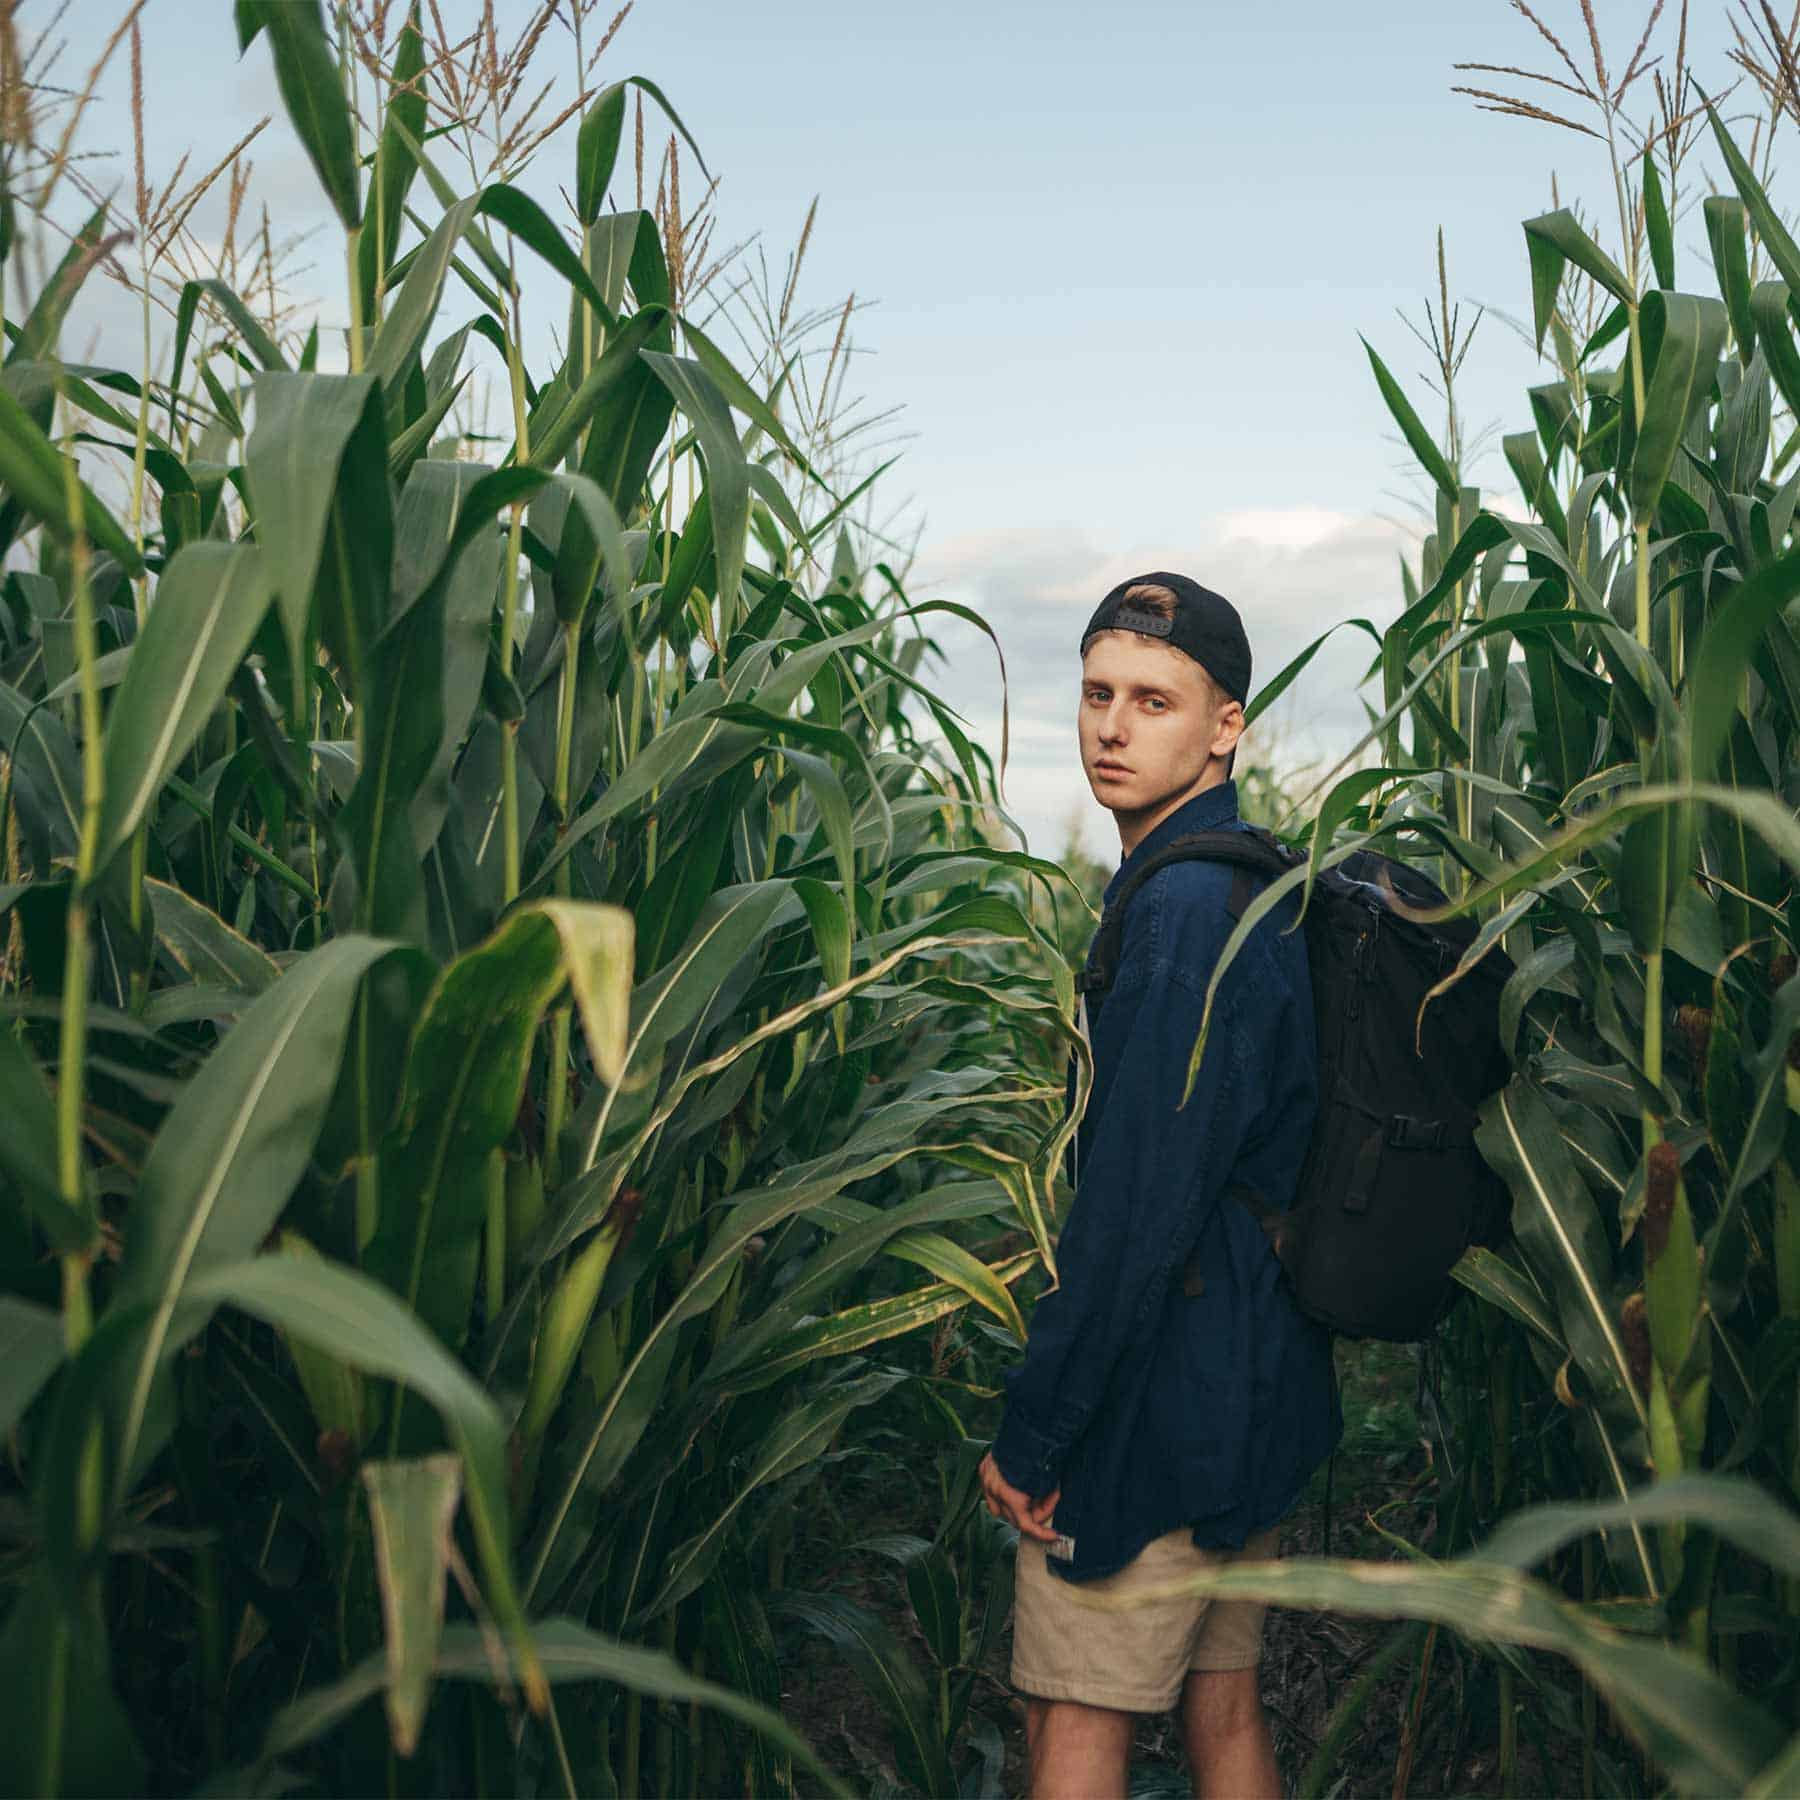 ASafePlace TeenageBoy Backpack RuralOutdoors